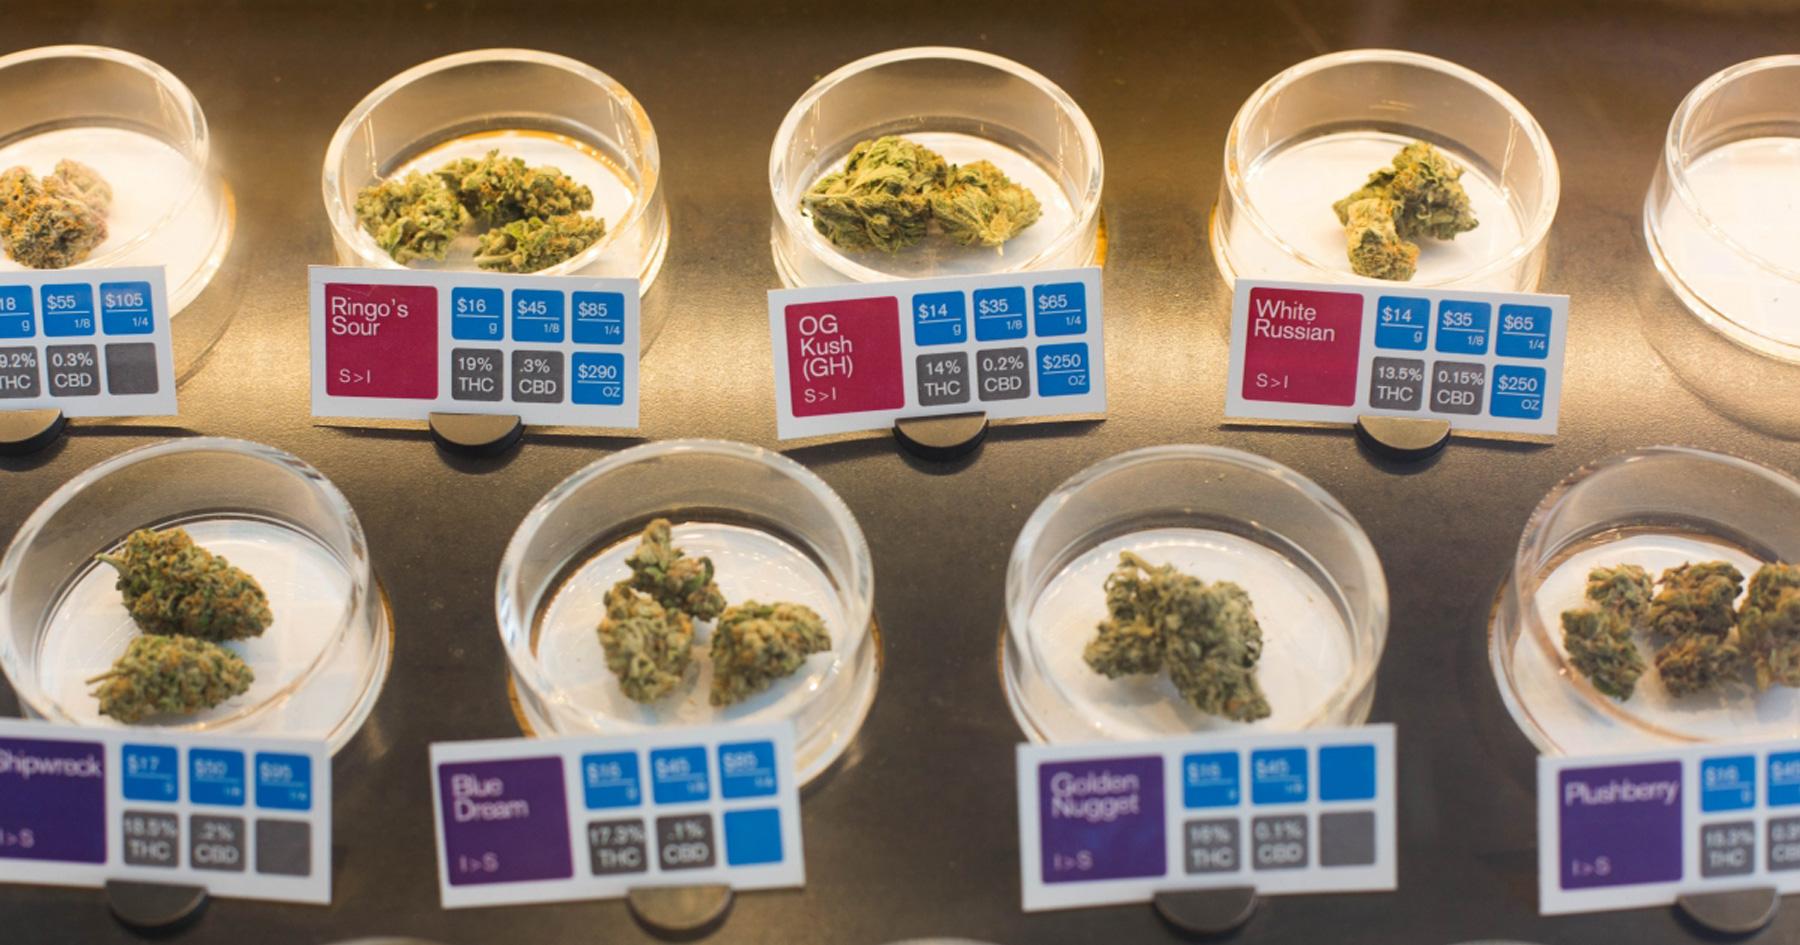 samples-of-medical-marijuana-strains